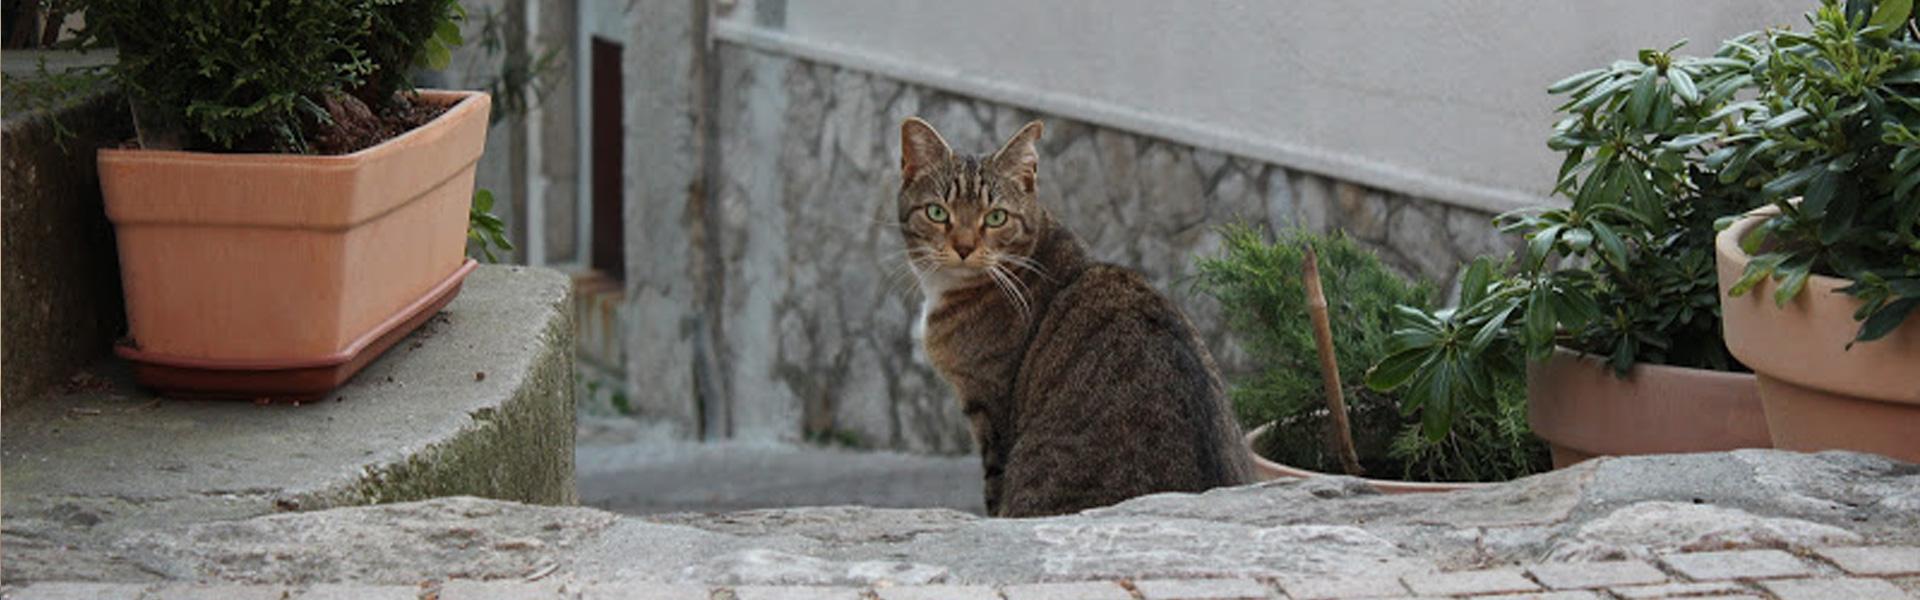 Cosa Animalia Association De Protection Animale Sur Grenoble